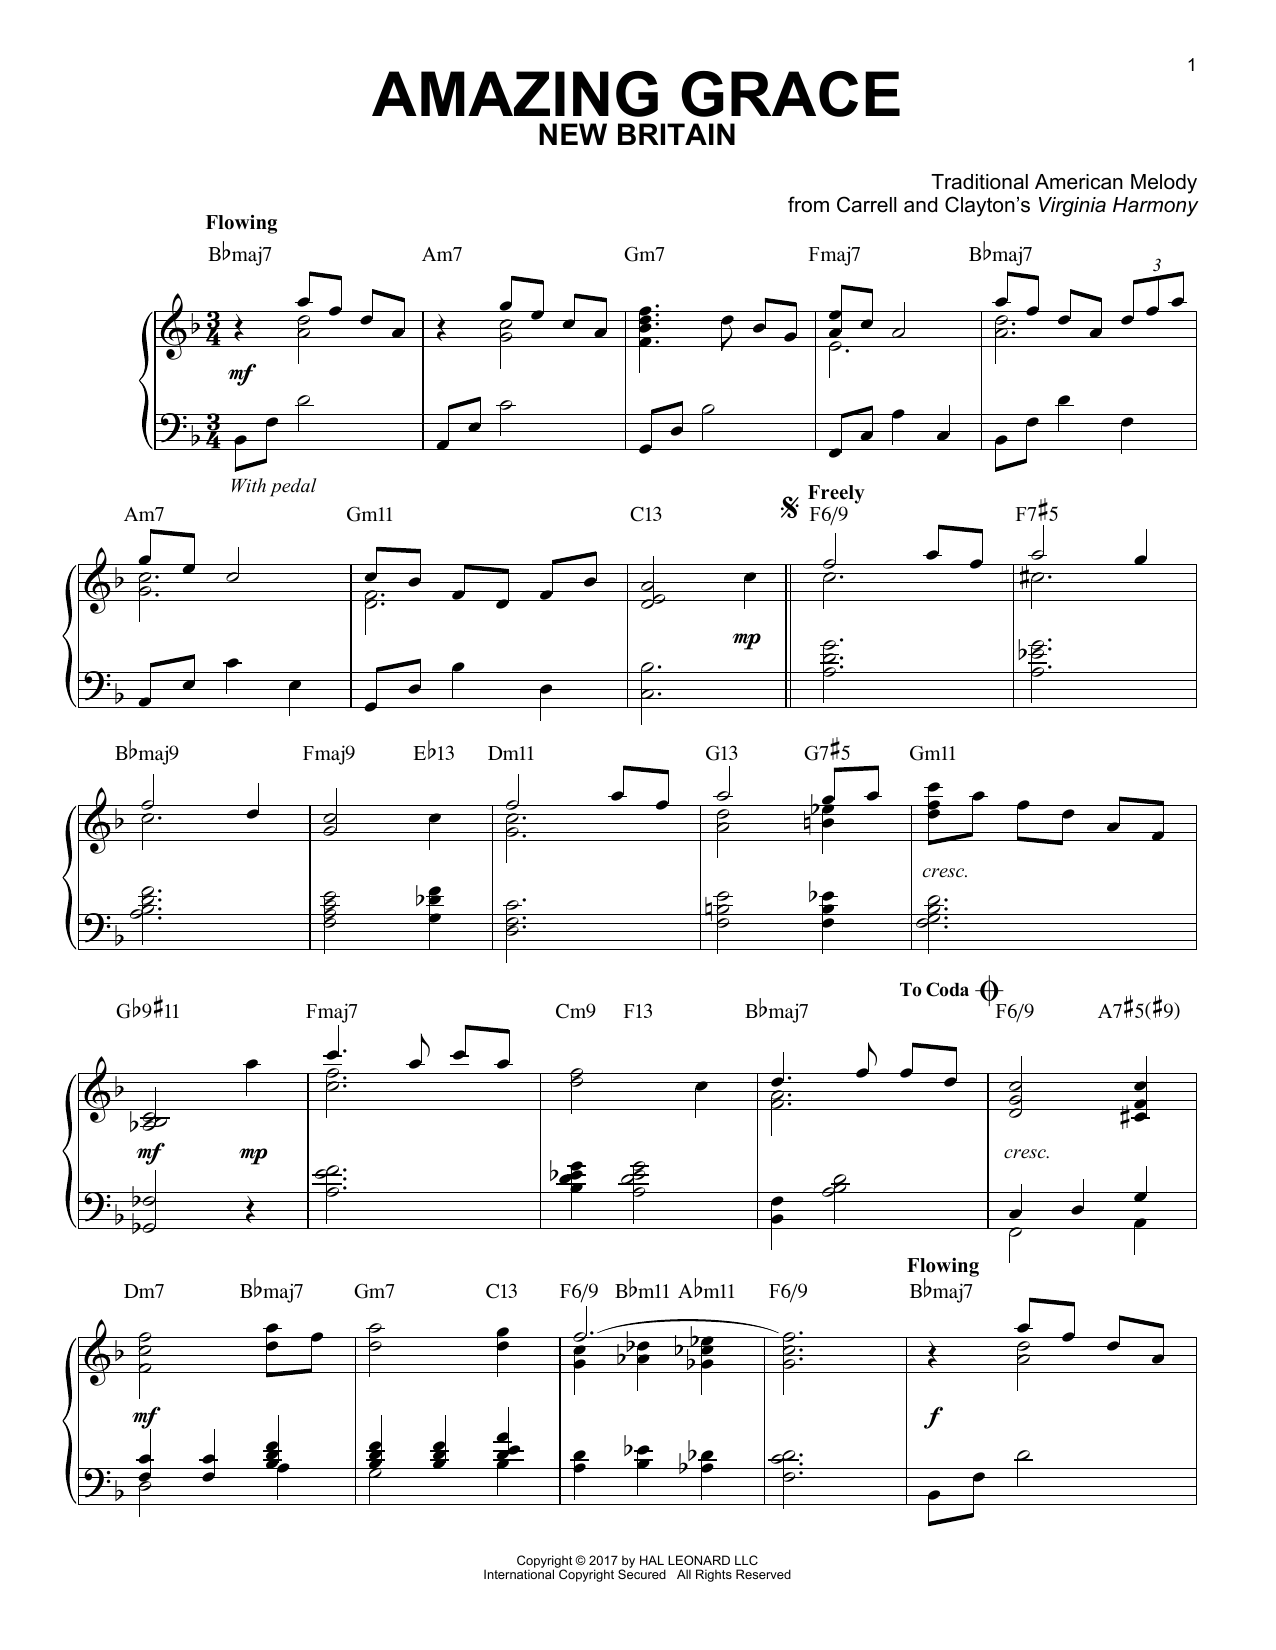 Super Sheet Music Digital Files To Print - Licensed Piano Solo Digital  GP69